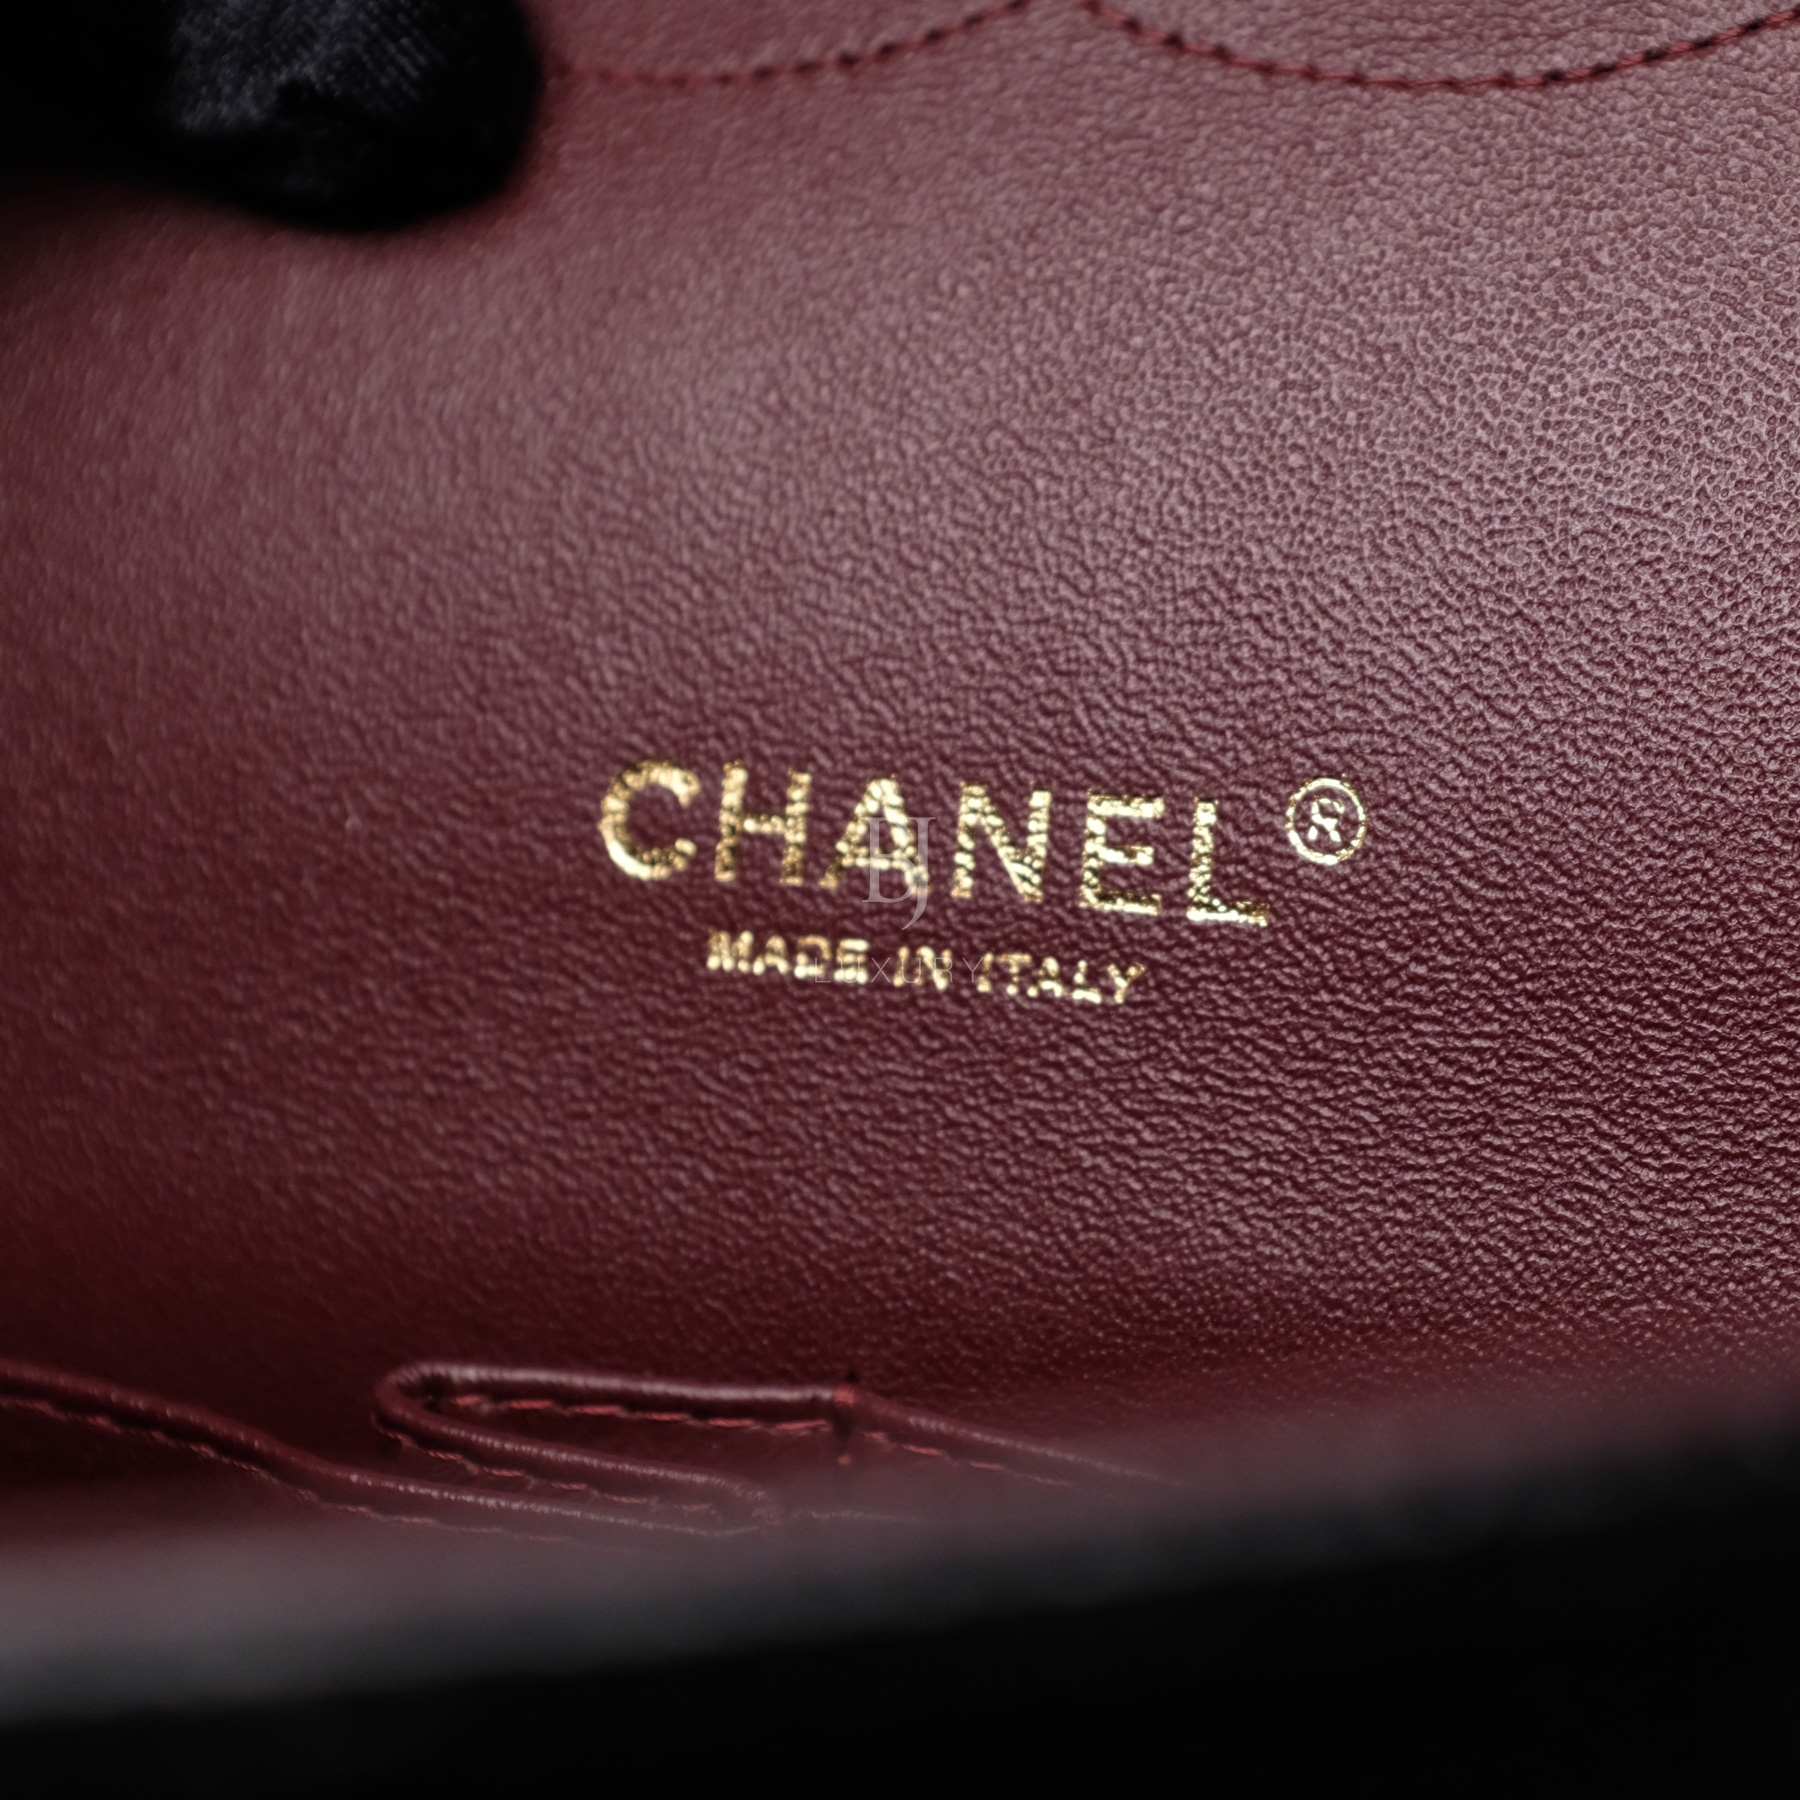 Chanel Classic Handbag Caviar Maxi Black BJ Luxury 19.jpg